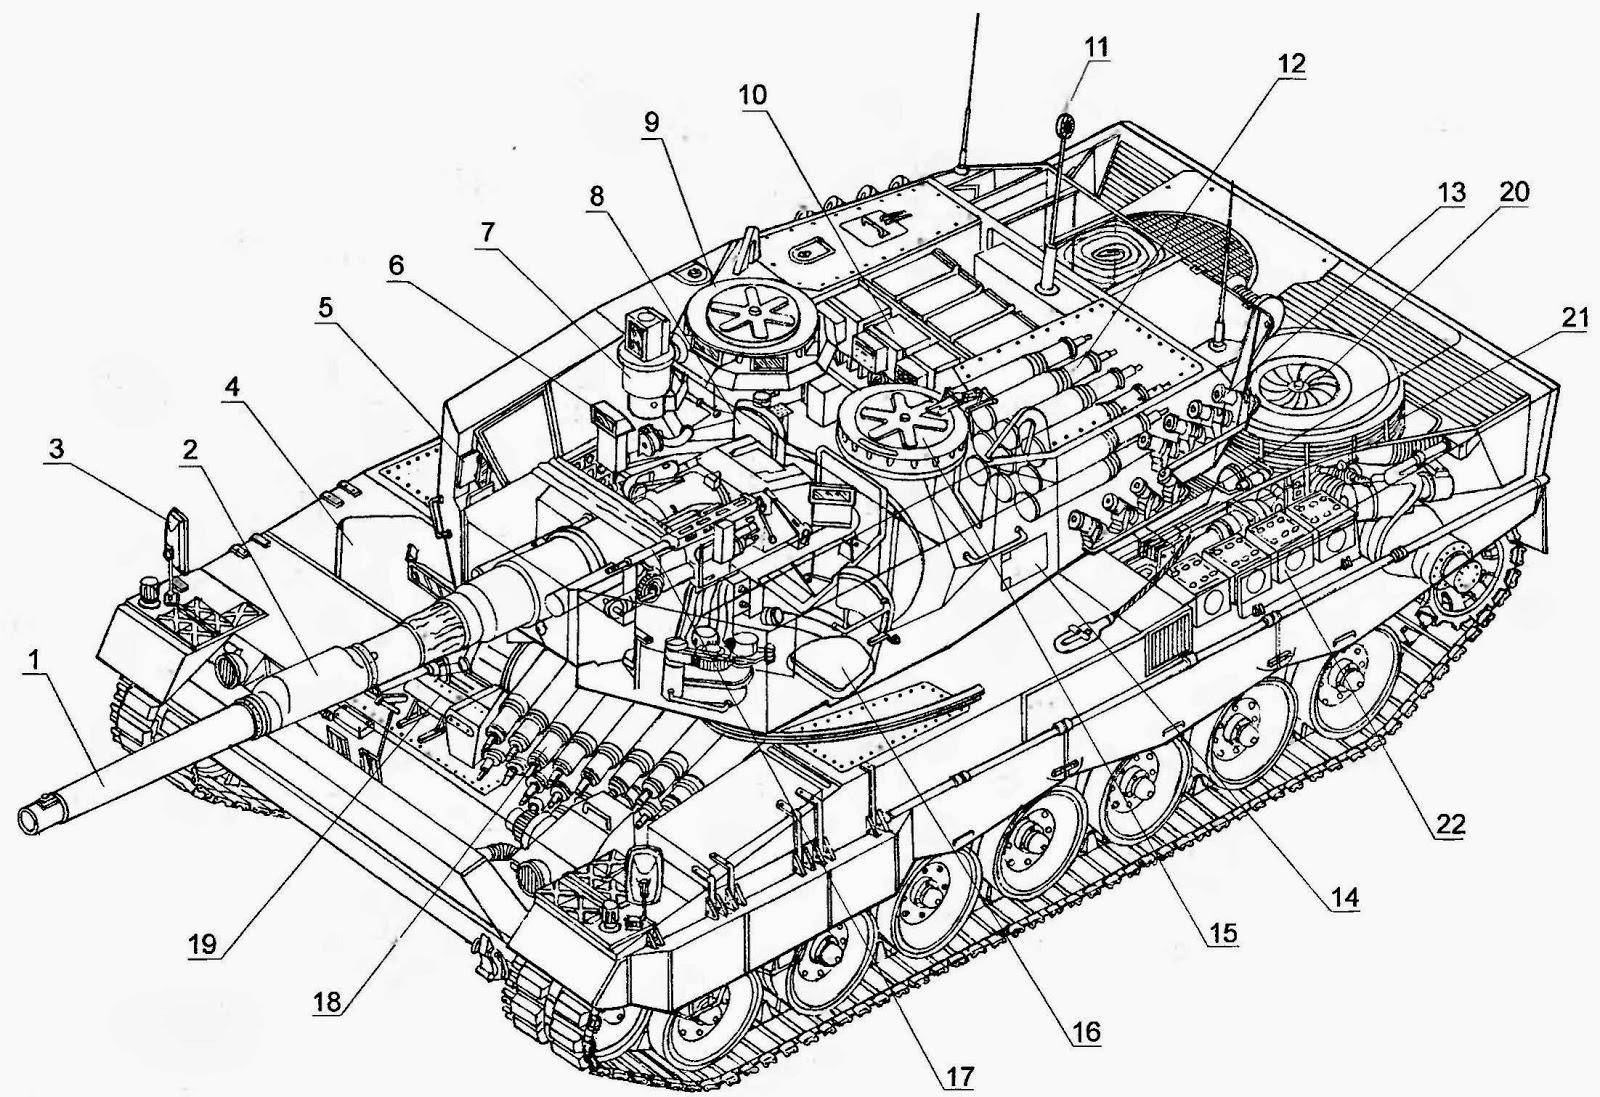 Tanks Dlc Feedback